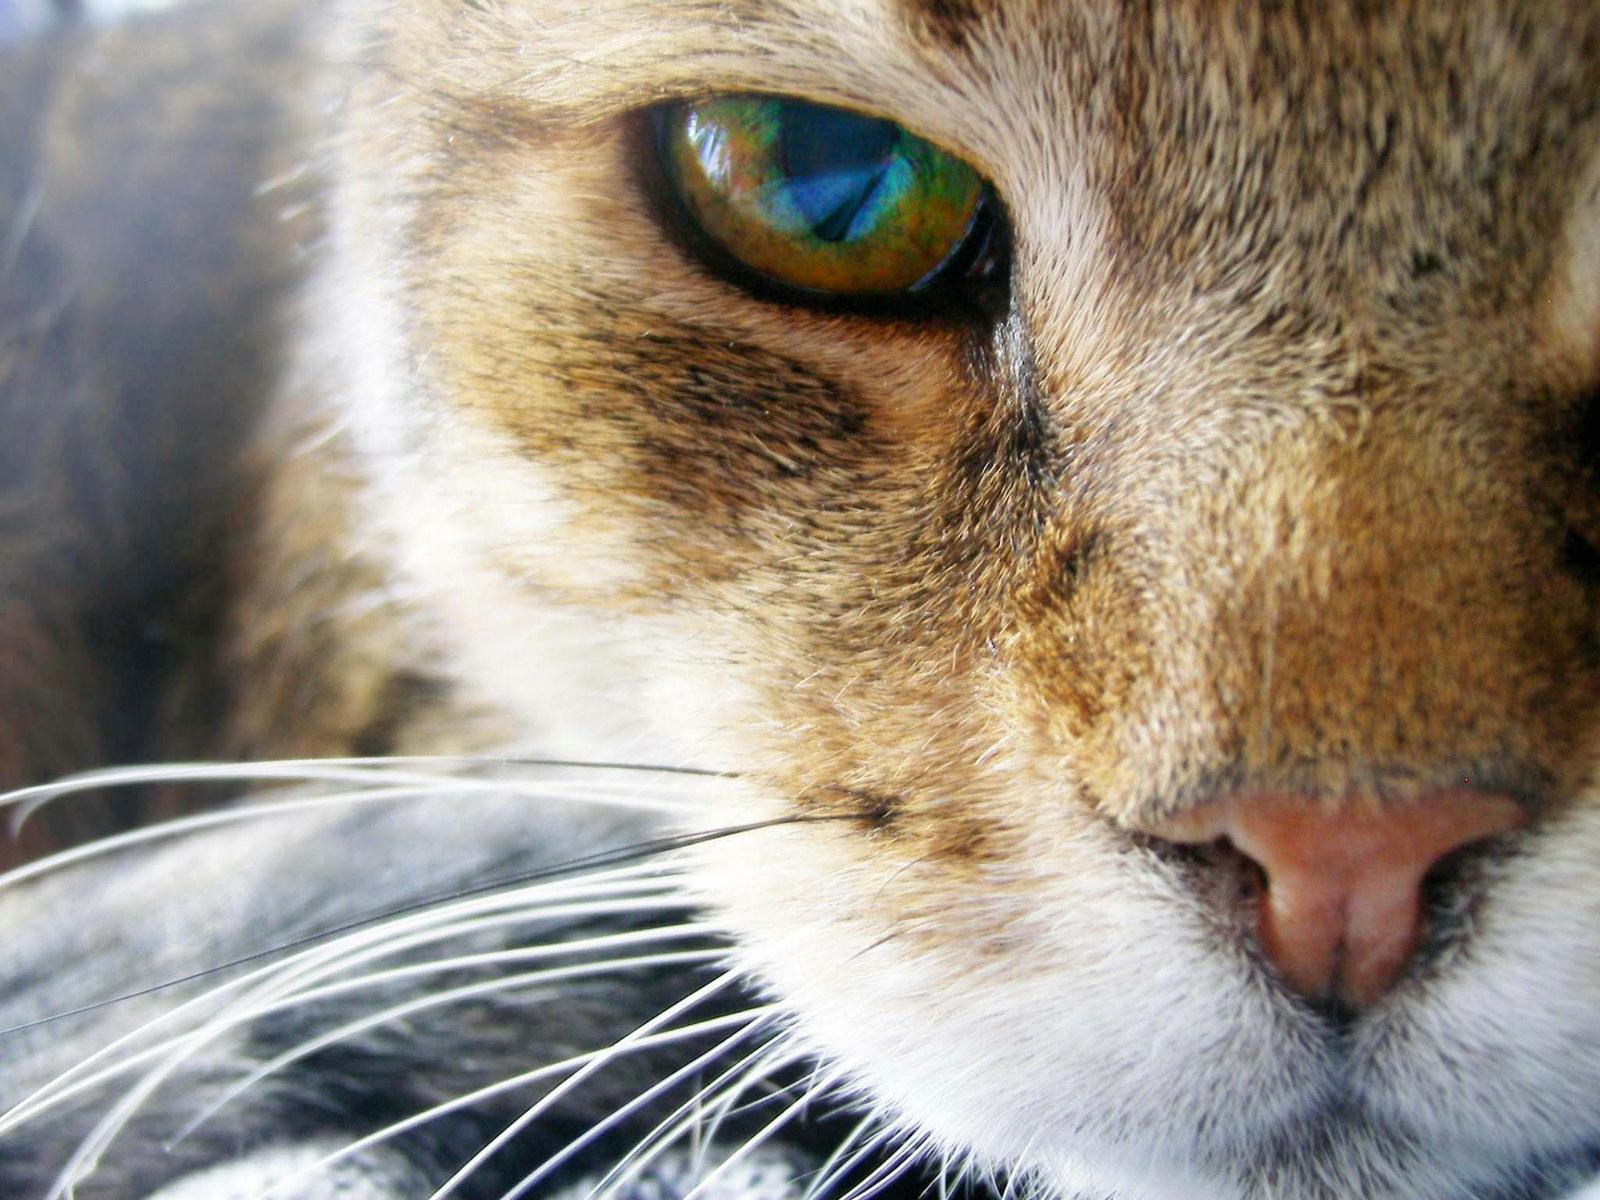 window 7 HD Wallpaper Animal HD Wallpapers 1600x1200